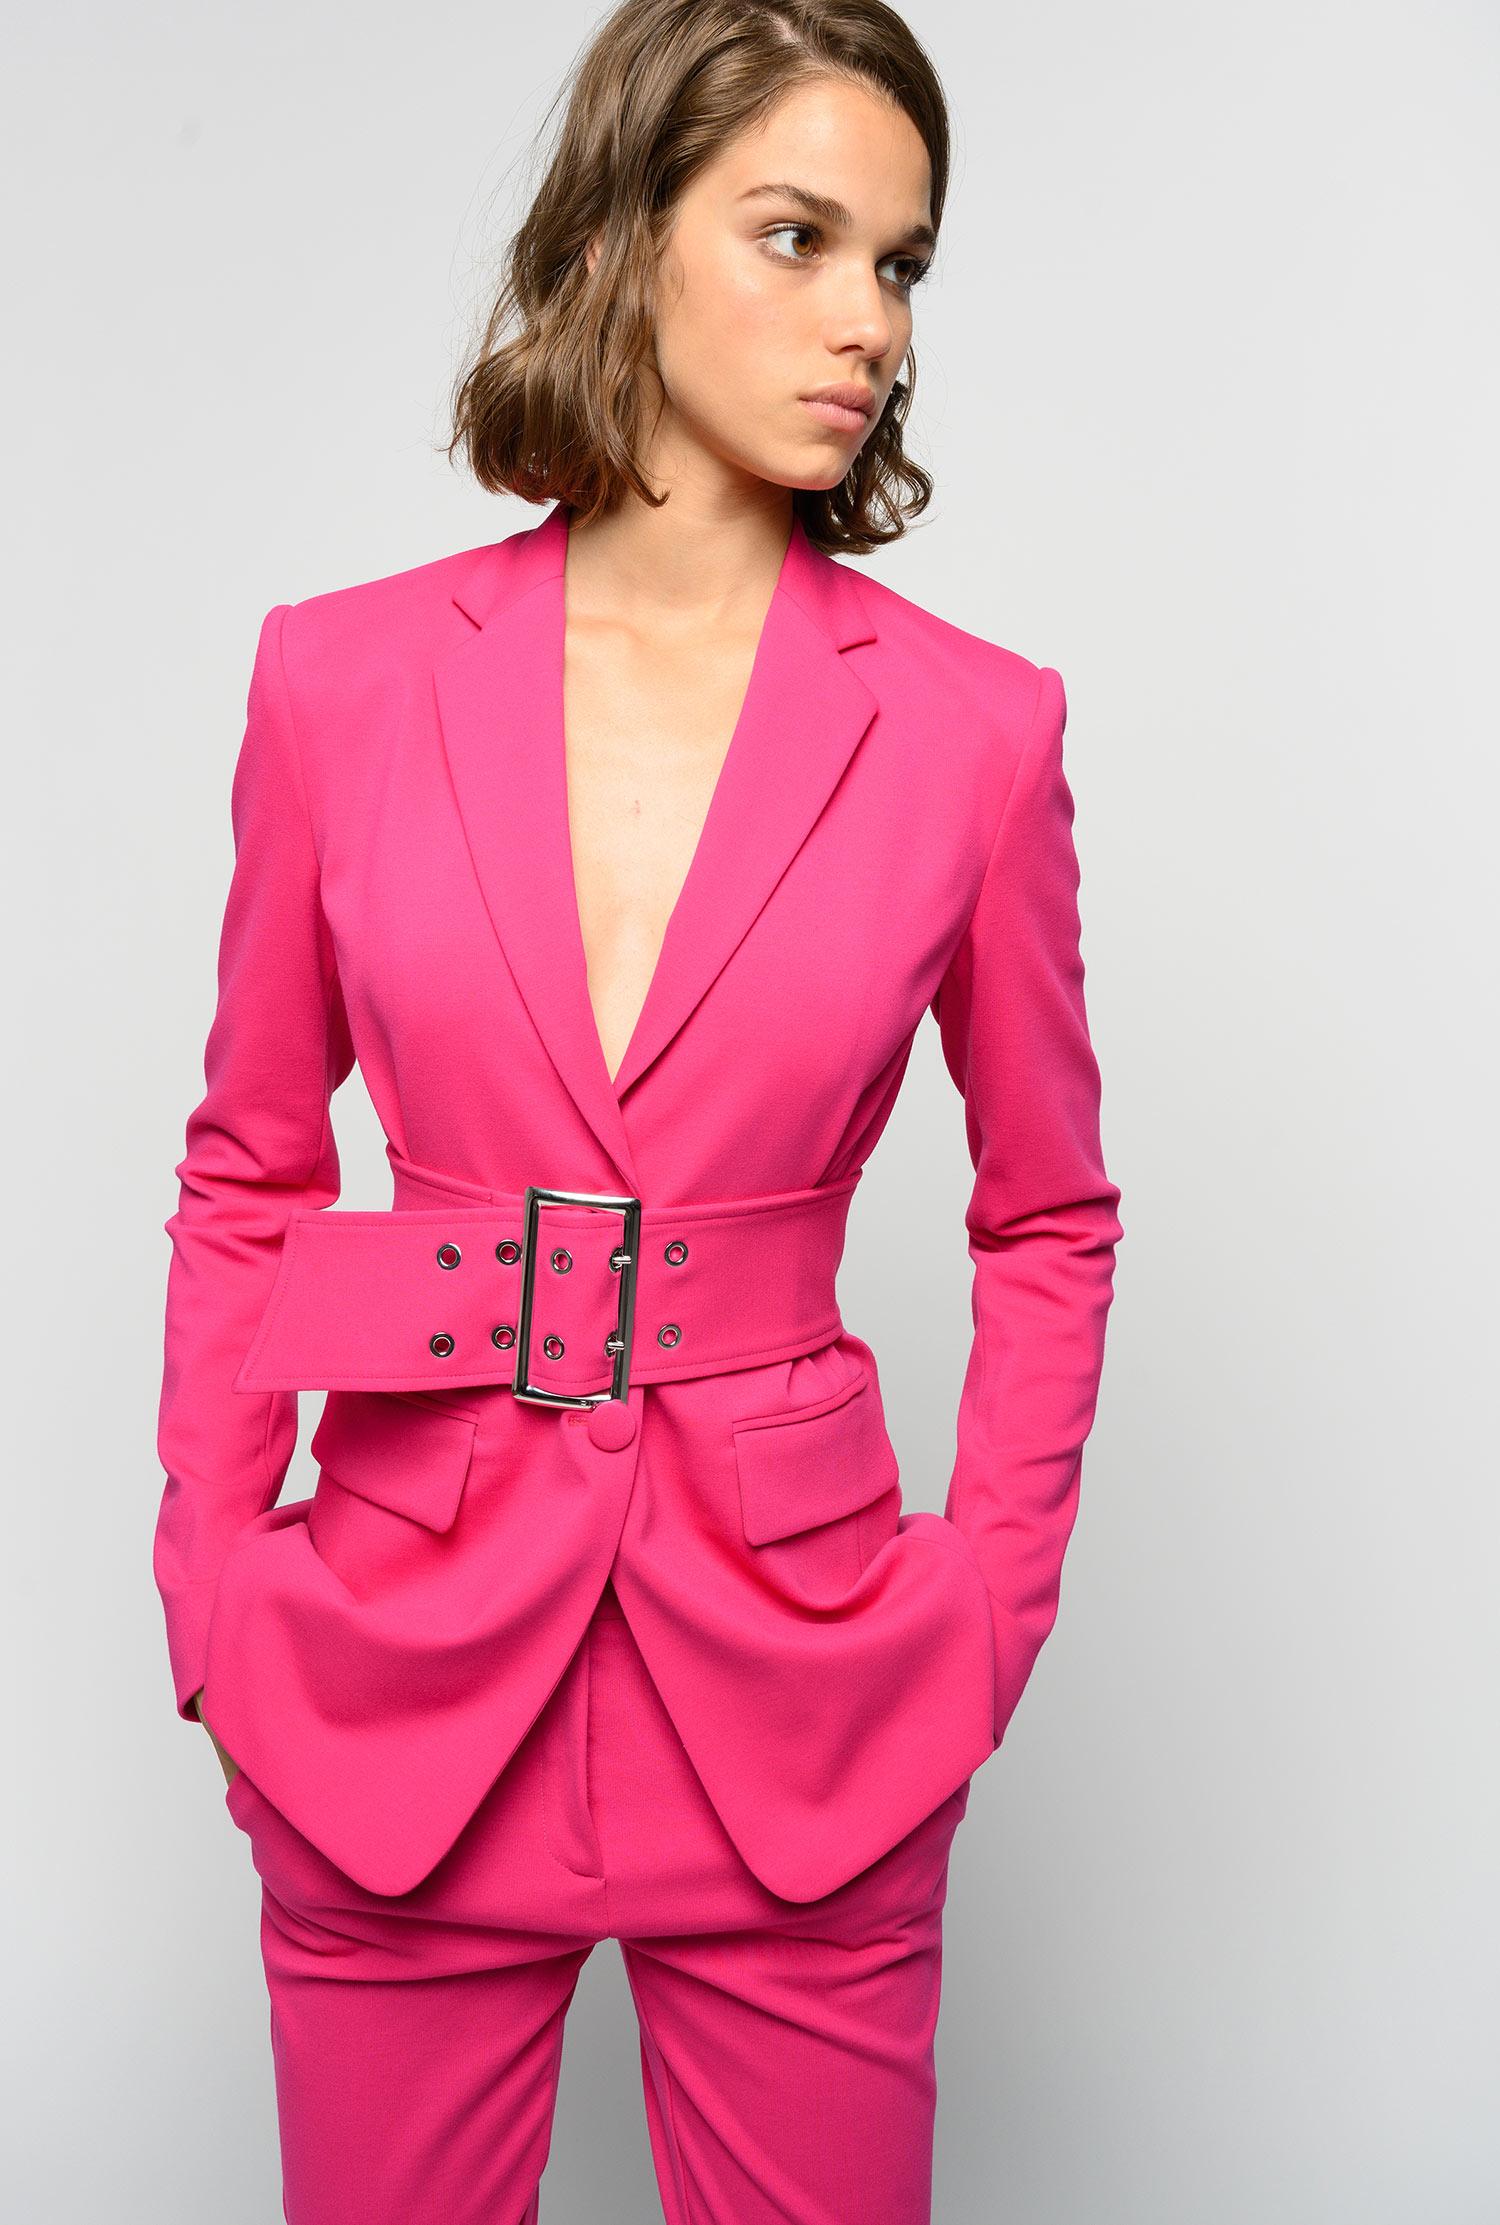 pinko blazer